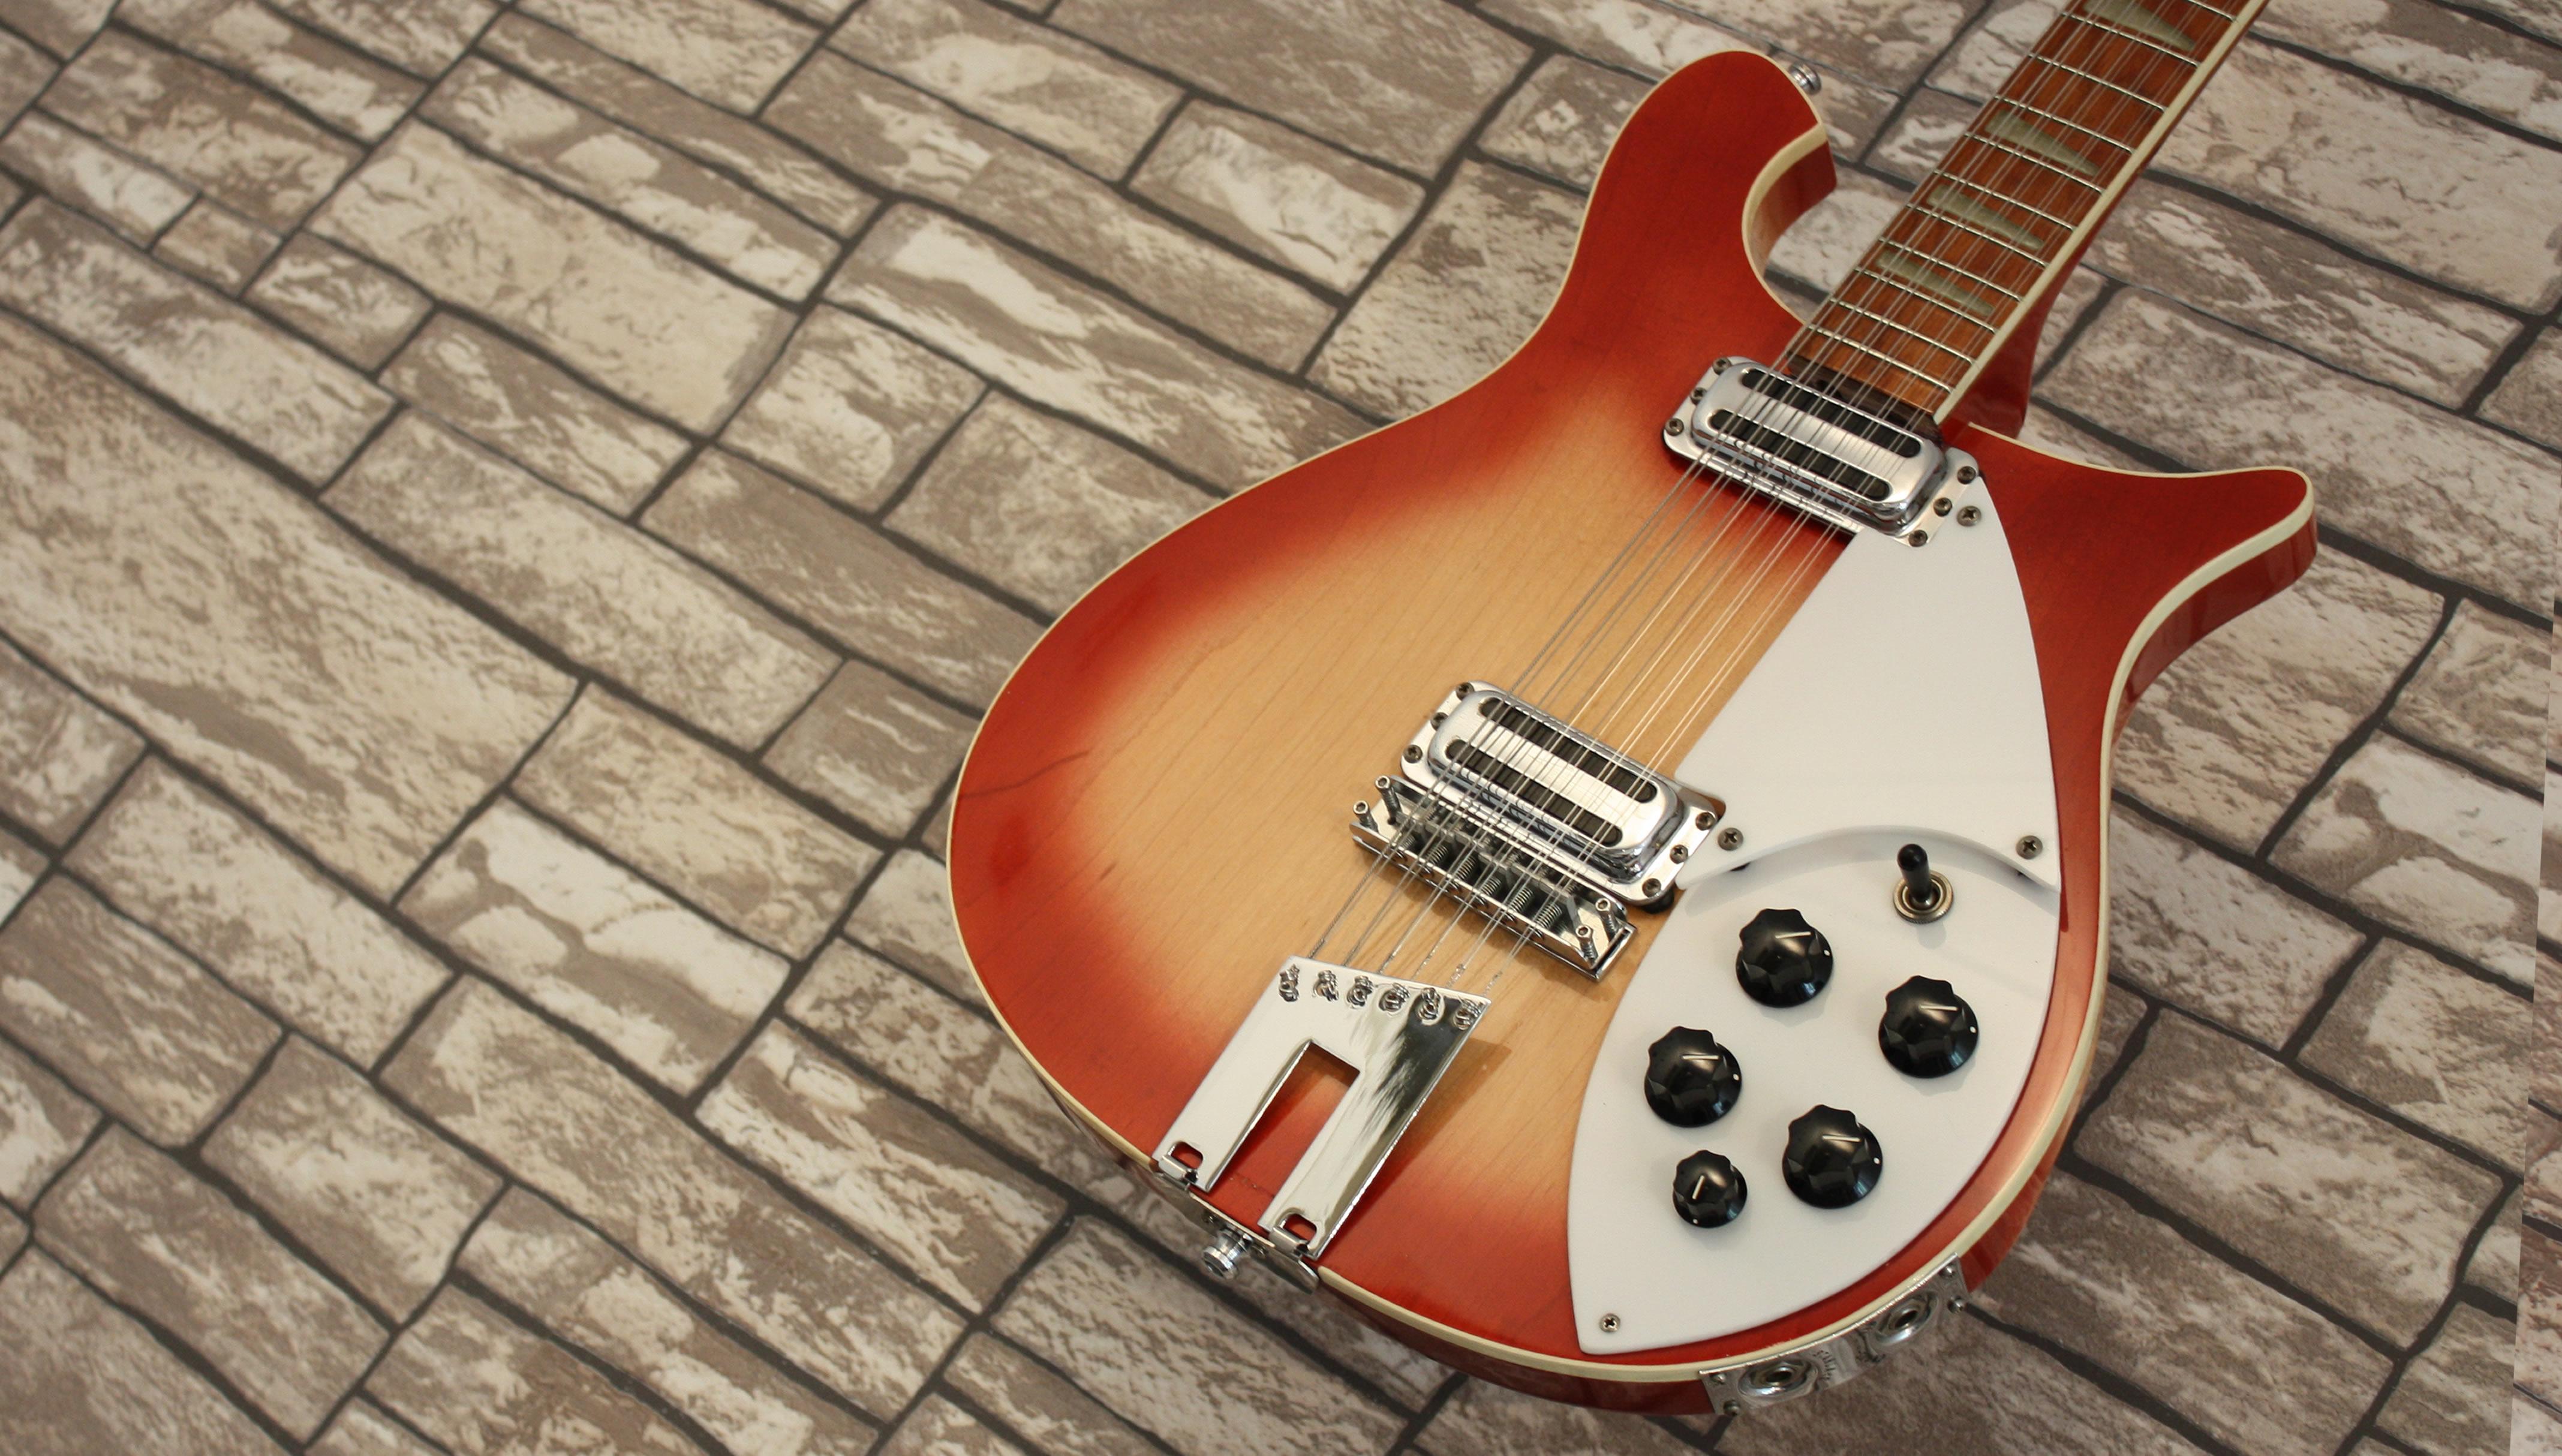 Rickenbacker 620-12 Fireglo 1985 Tom Petty Mod